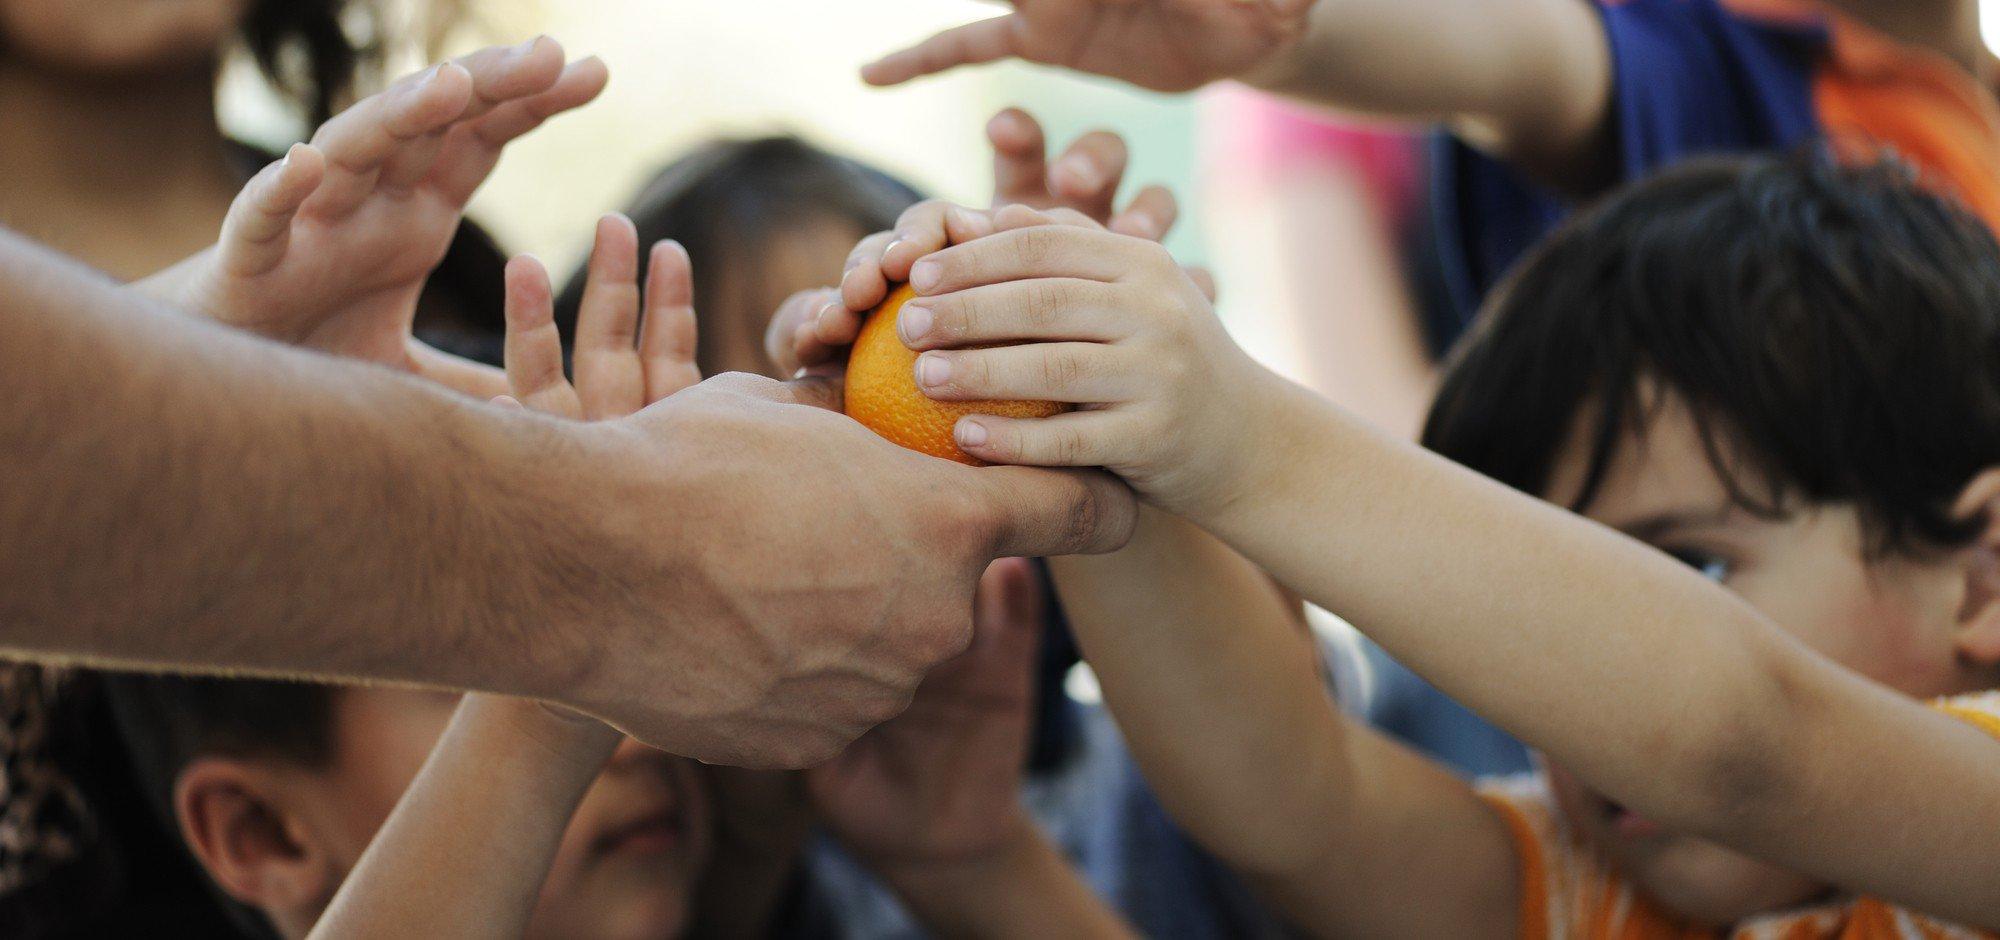 international-day-of-charity-1-e1450098273597.jpg